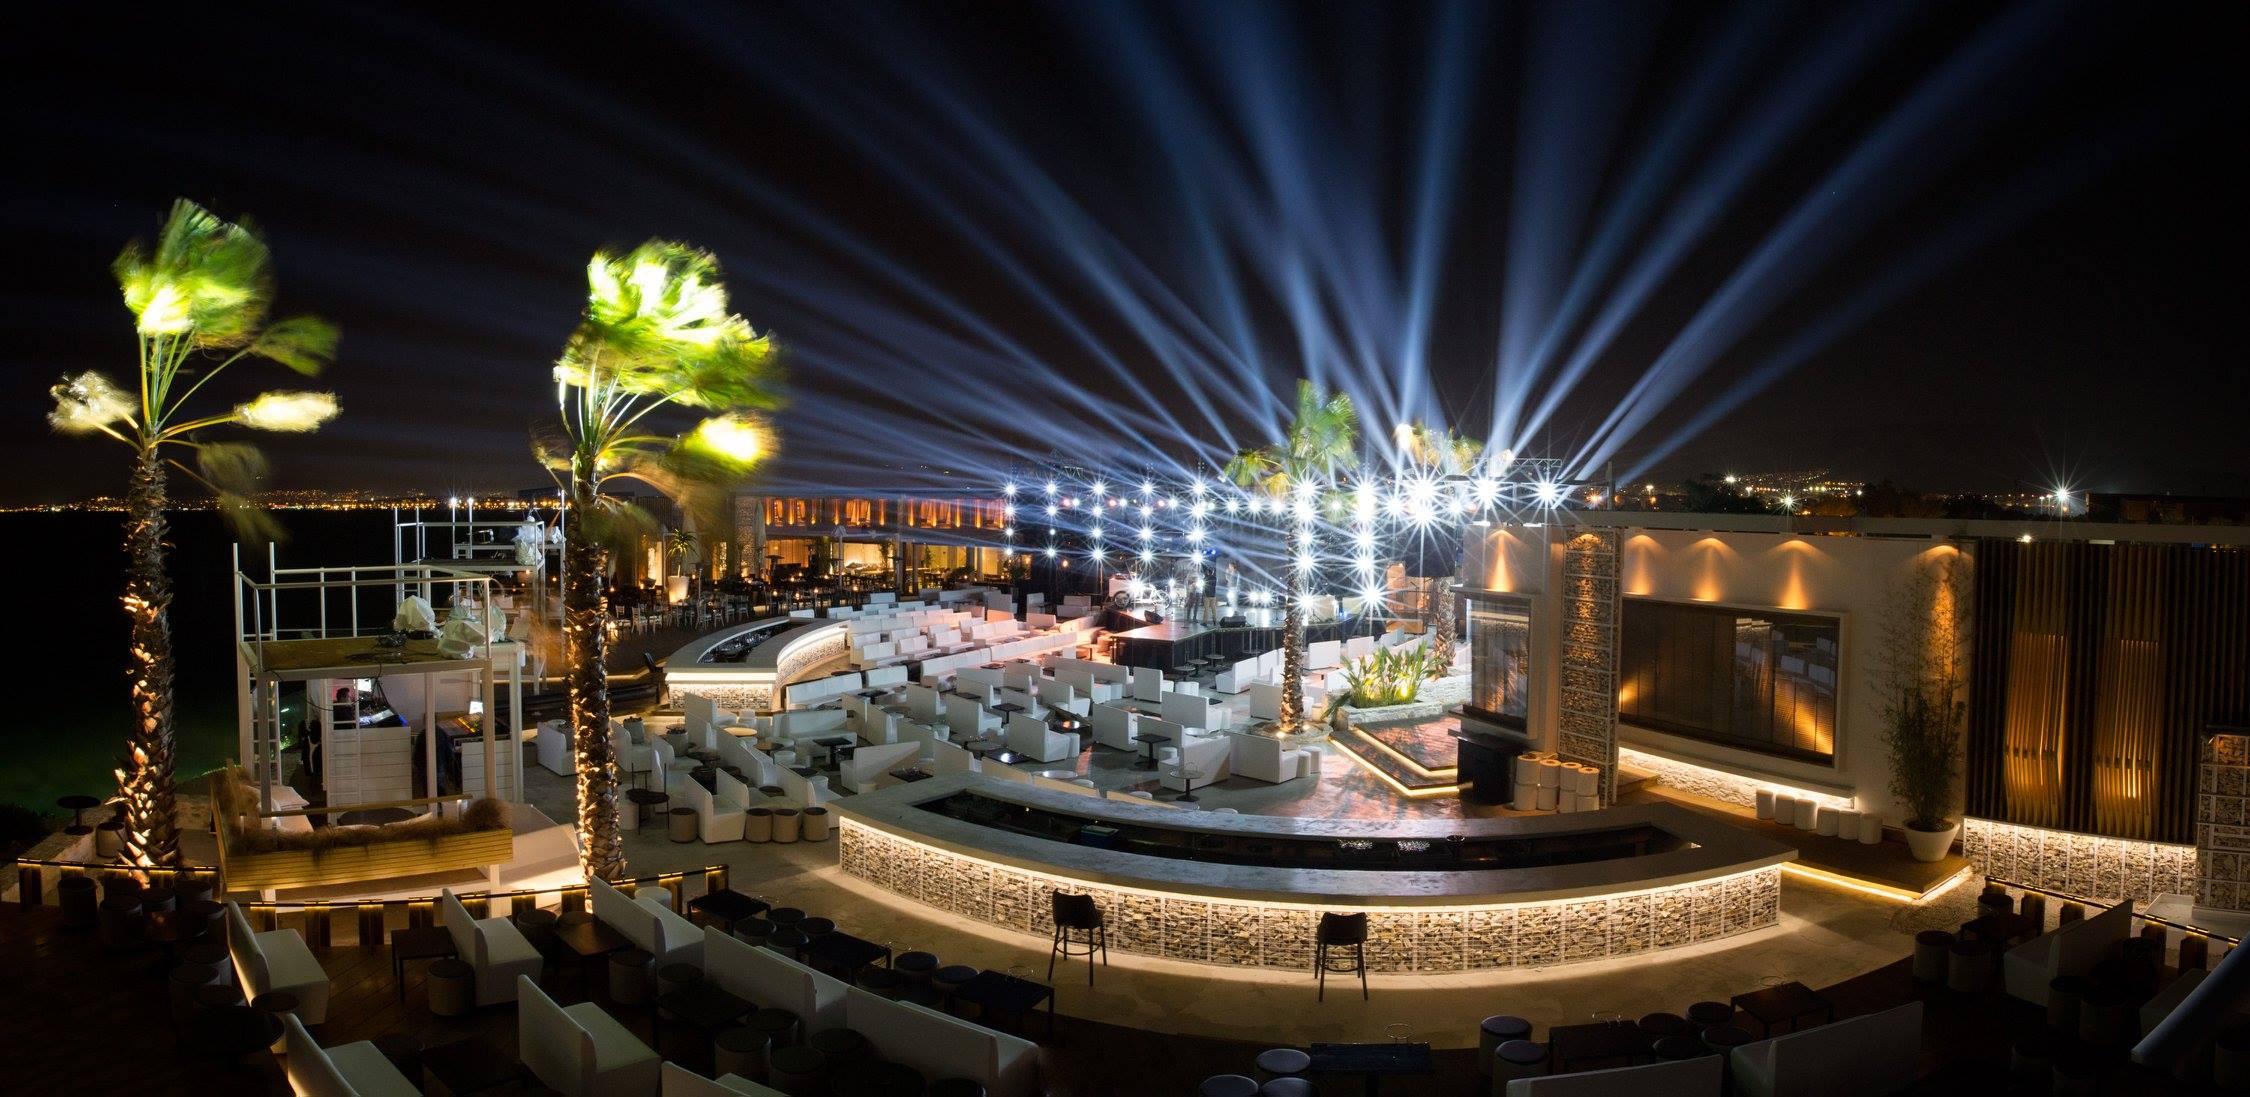 Estate Seaside @ Akrotiri for a live Greek pop experience like a local (Picture via Facebook)